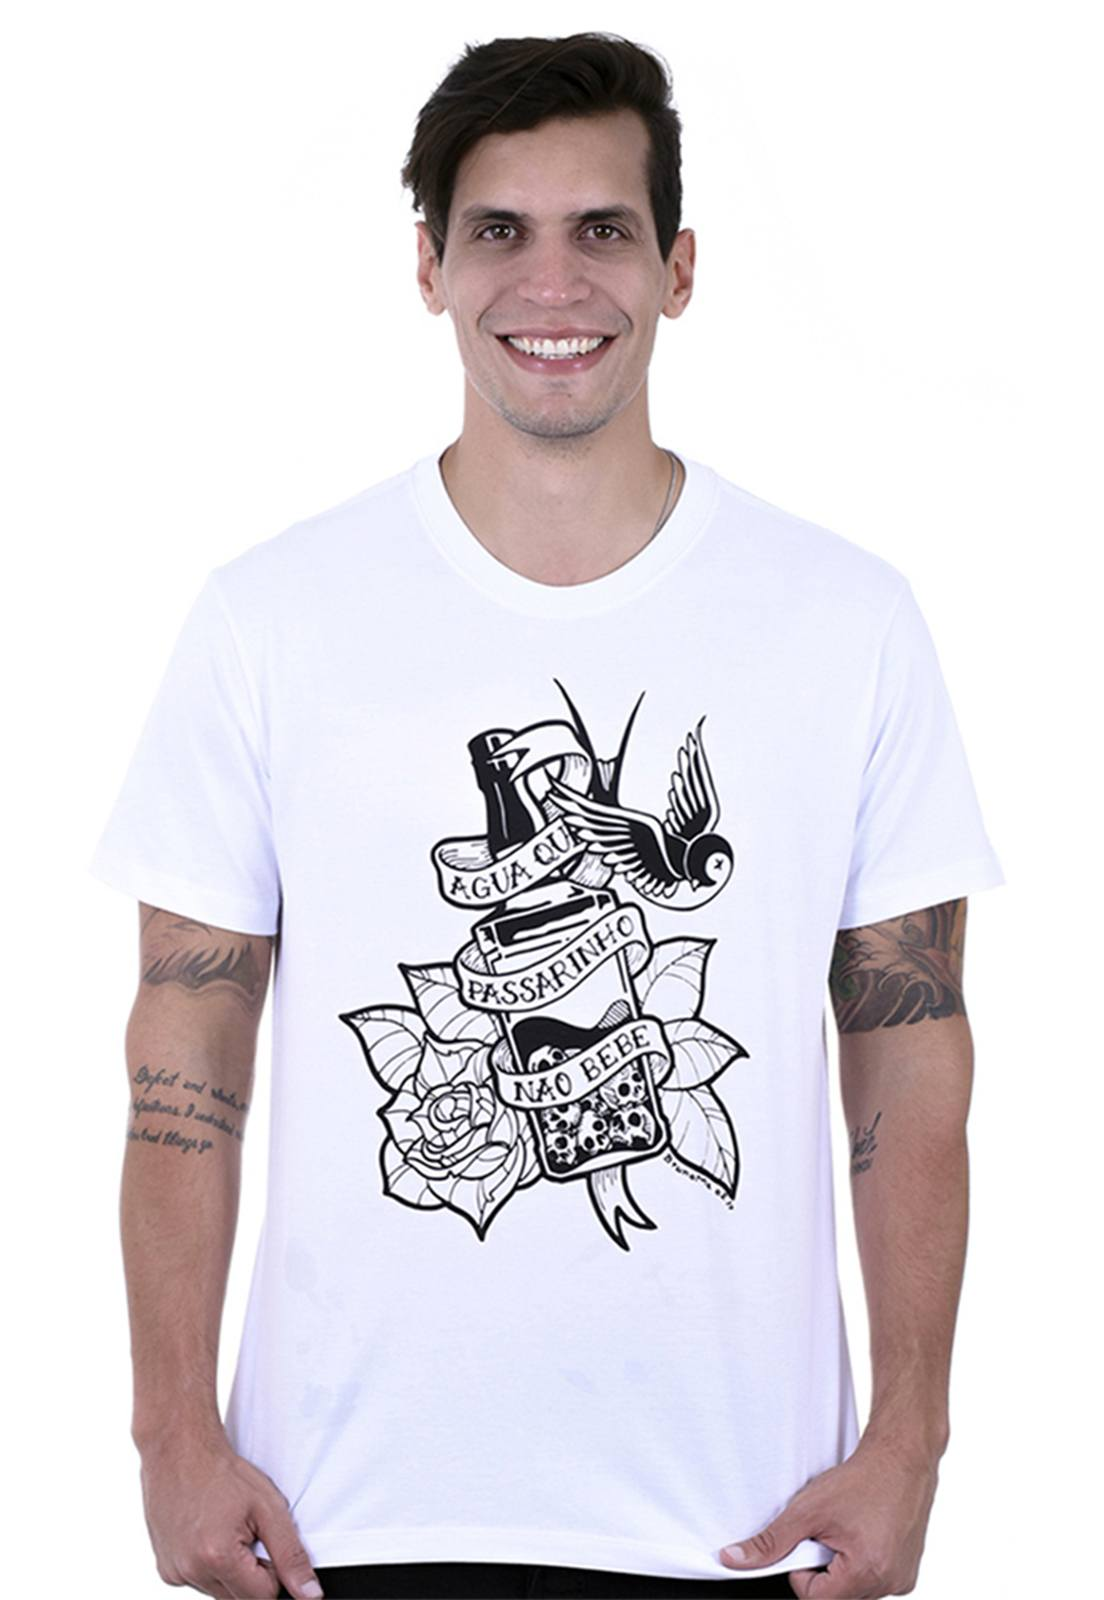 Camiseta masculina branca Jack - 100% algodão - Hardivision